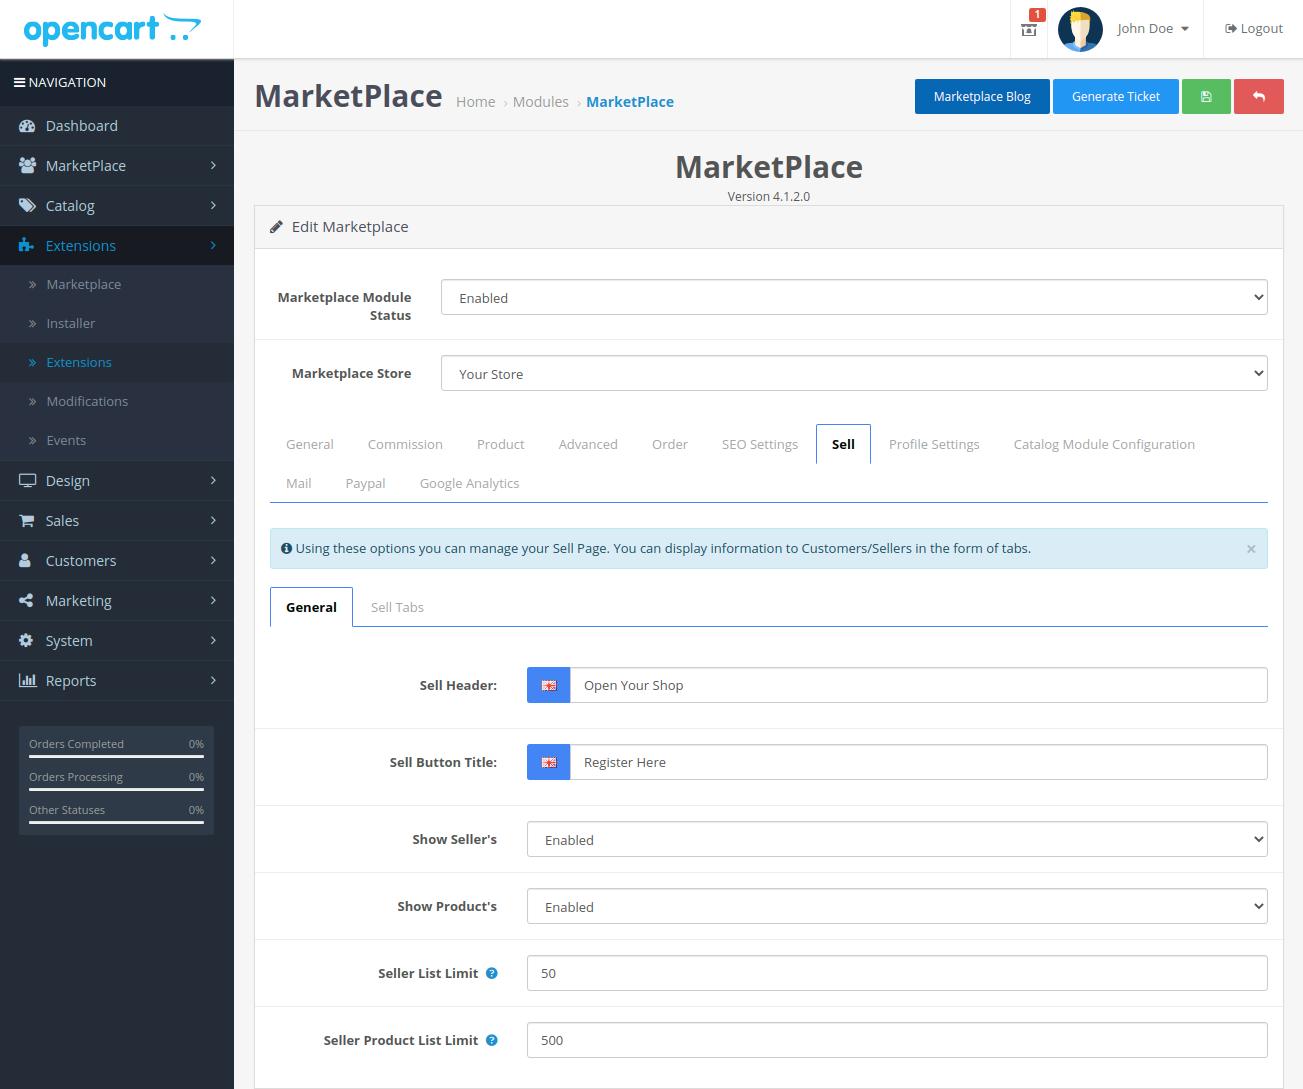 webkul-opencart-multi-vendor-marketplace-sell-tab-general